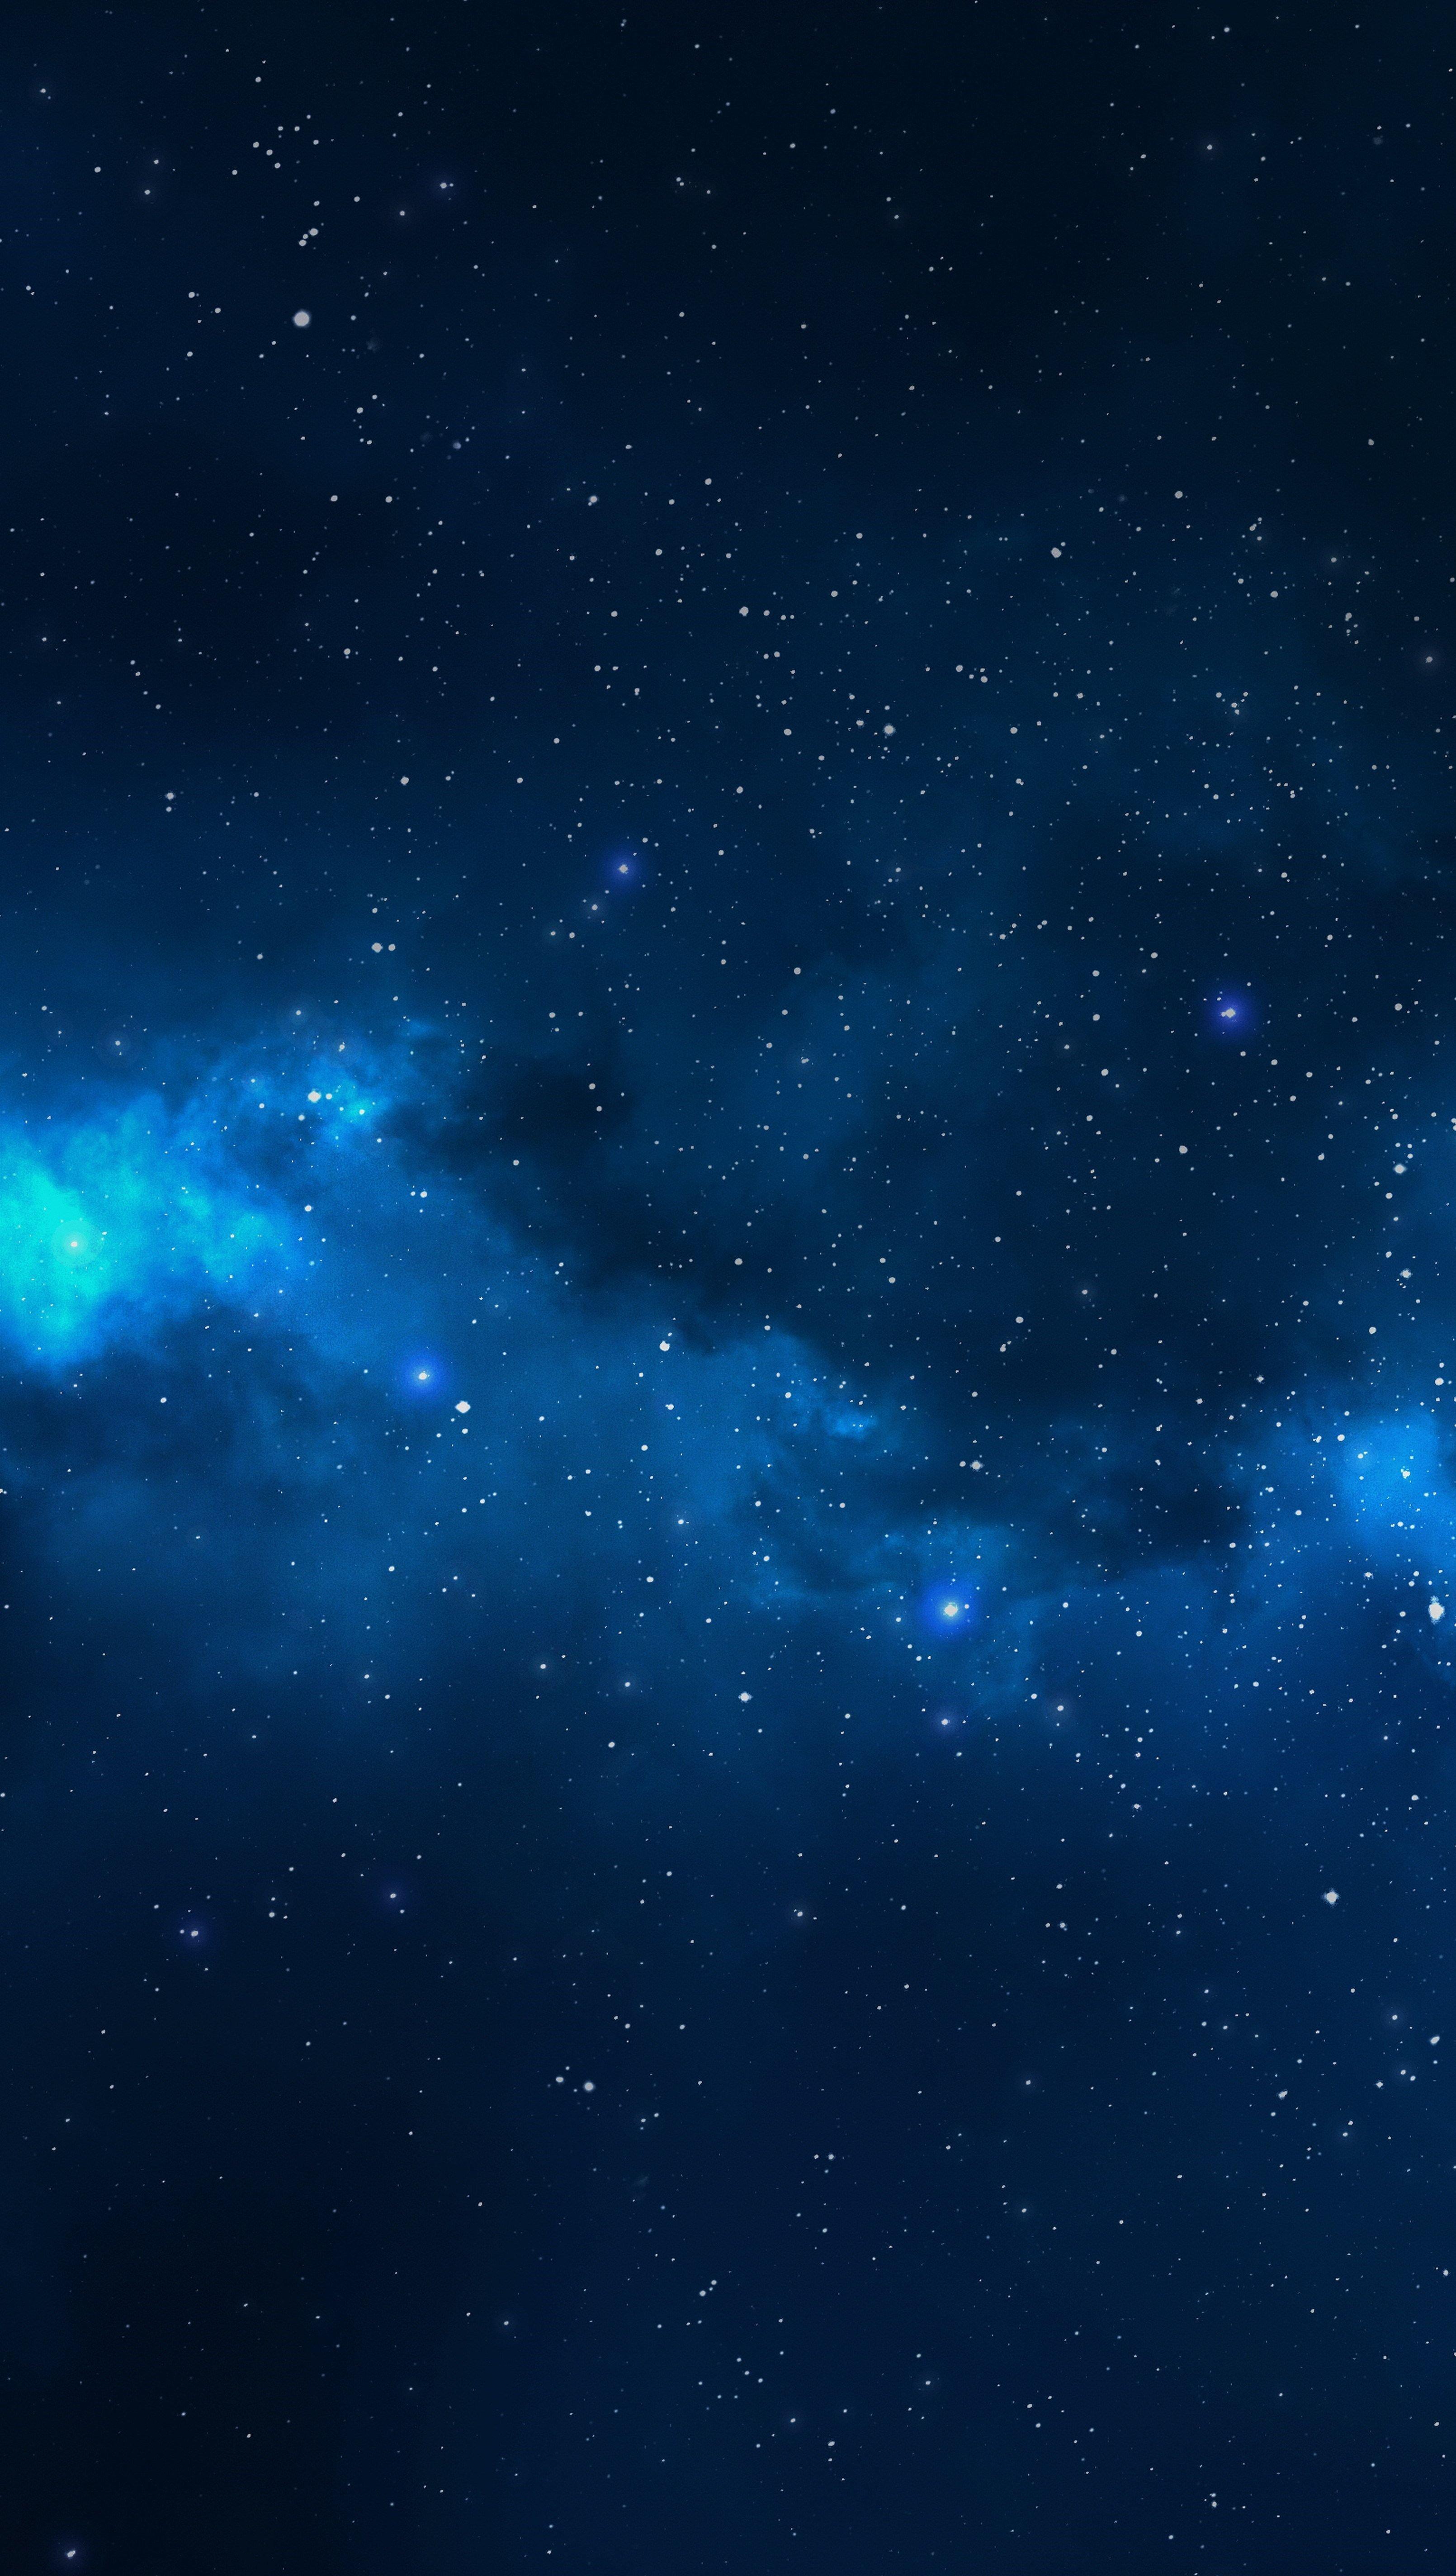 Wallpaper Universe - Interstellar space Vertical